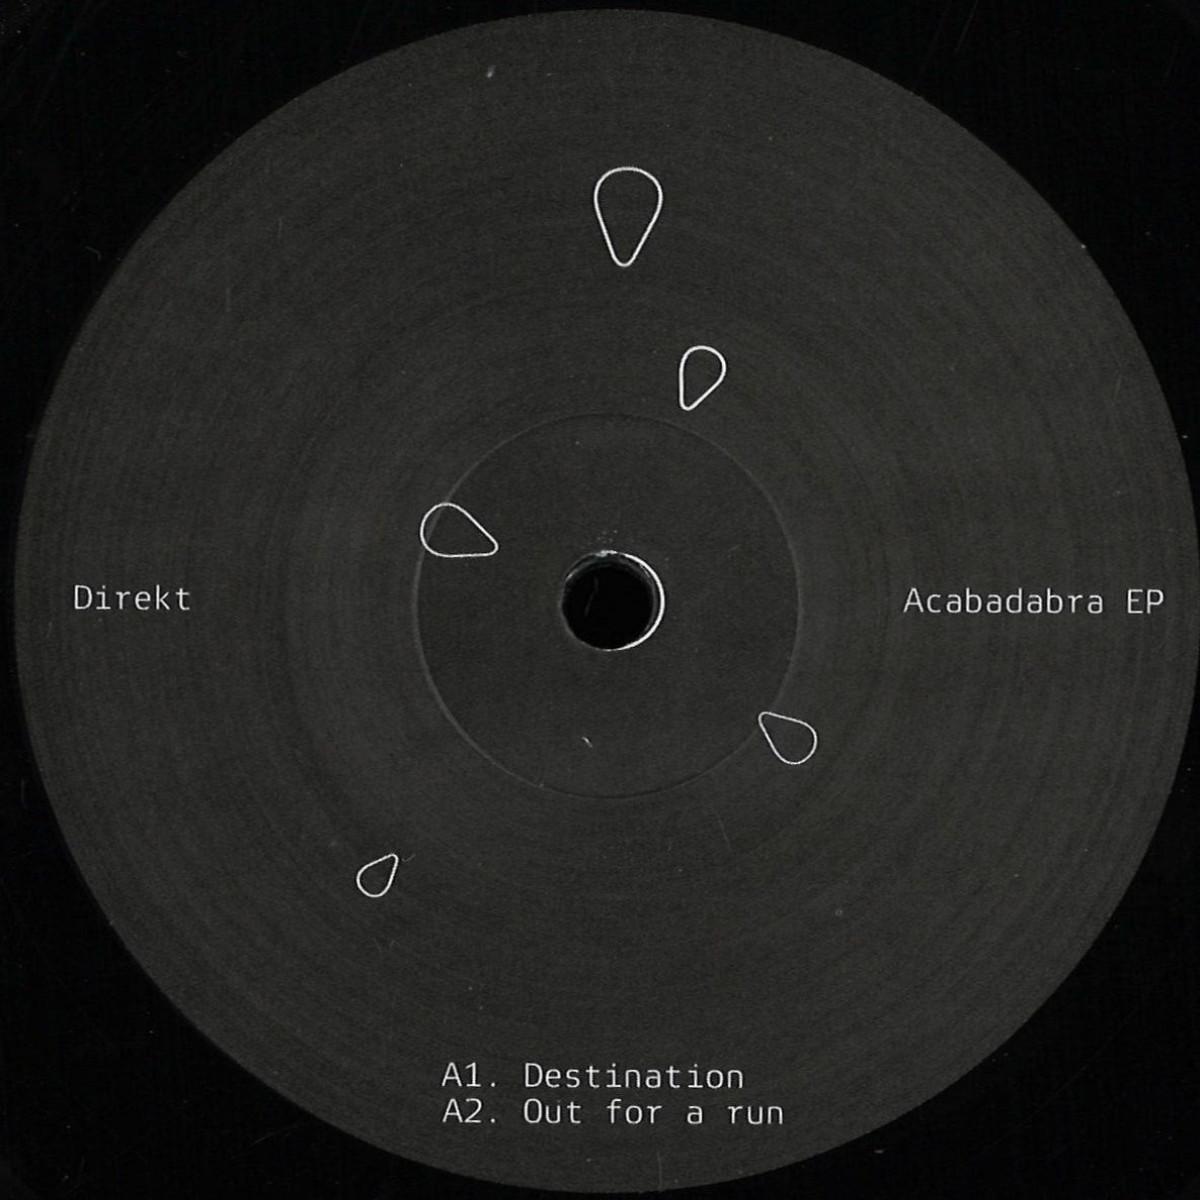 Direkt - Acabadabra EP [Uvar]